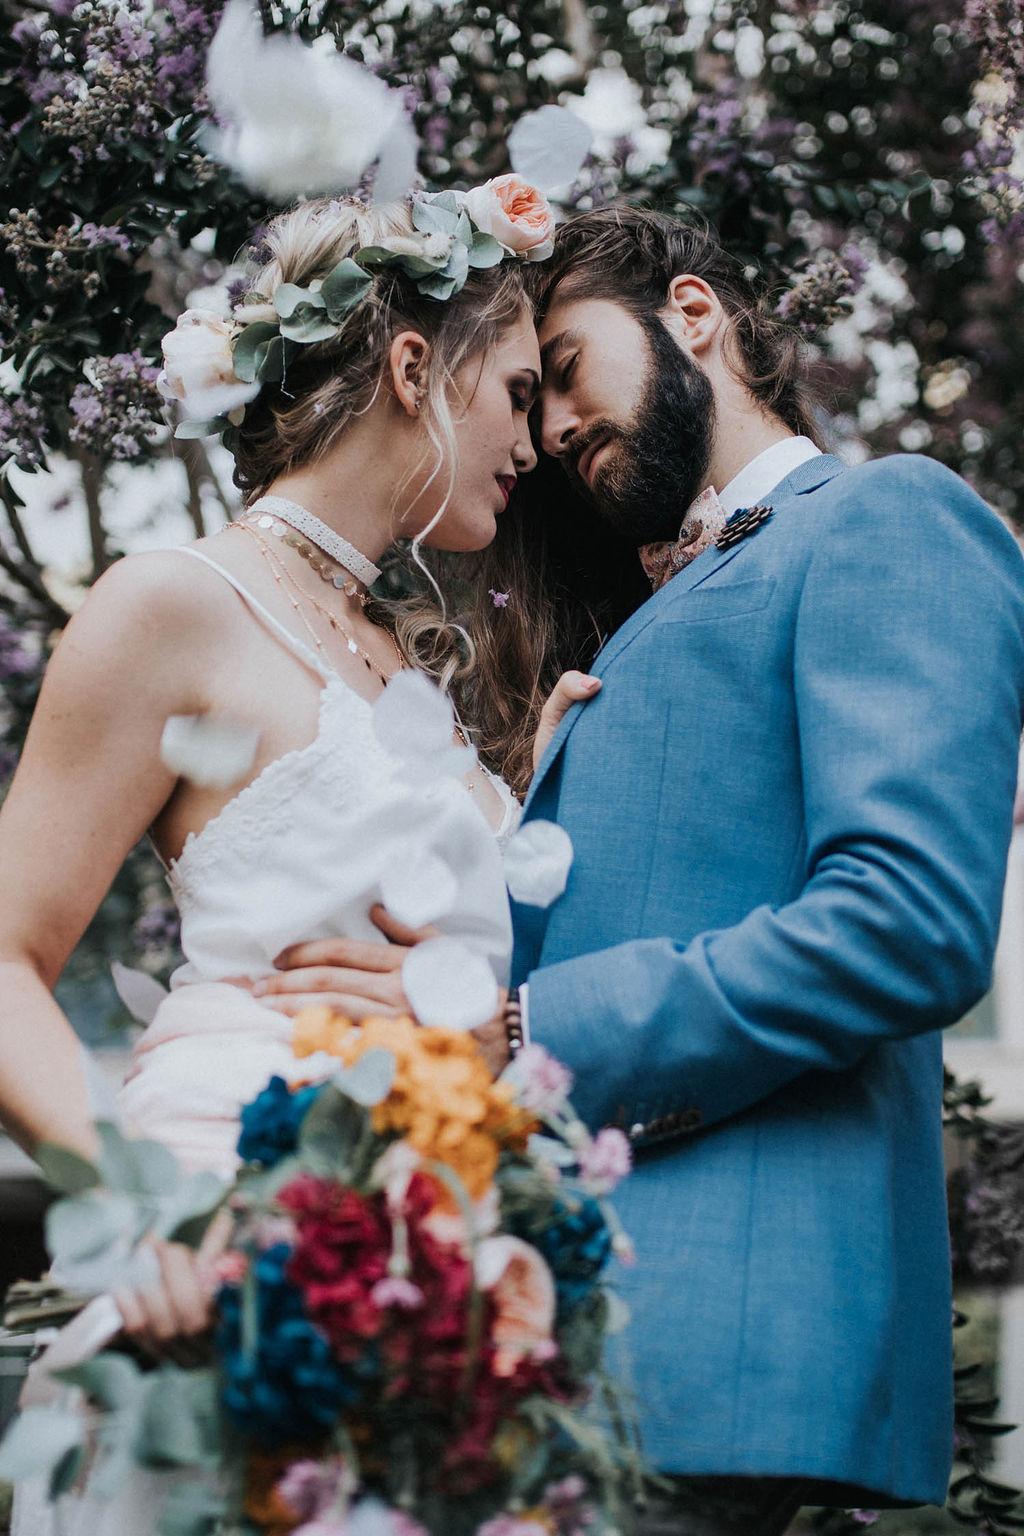 2_5_boheme_couple_4_looks_sidneyonthemoon_photographe_chrisvonmartial_robe_mariee_costume_paris_wedding_web